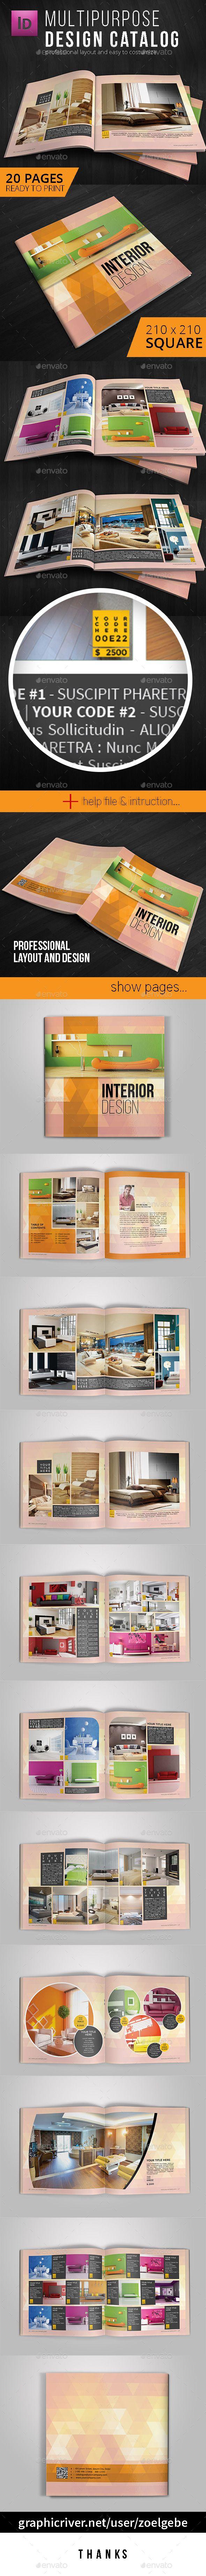 Square Modern Brochure / Catalog Template. Download: http://graphicriver.net/item/square-modern-brochure-catalog-template/11260922?ref=ksioks